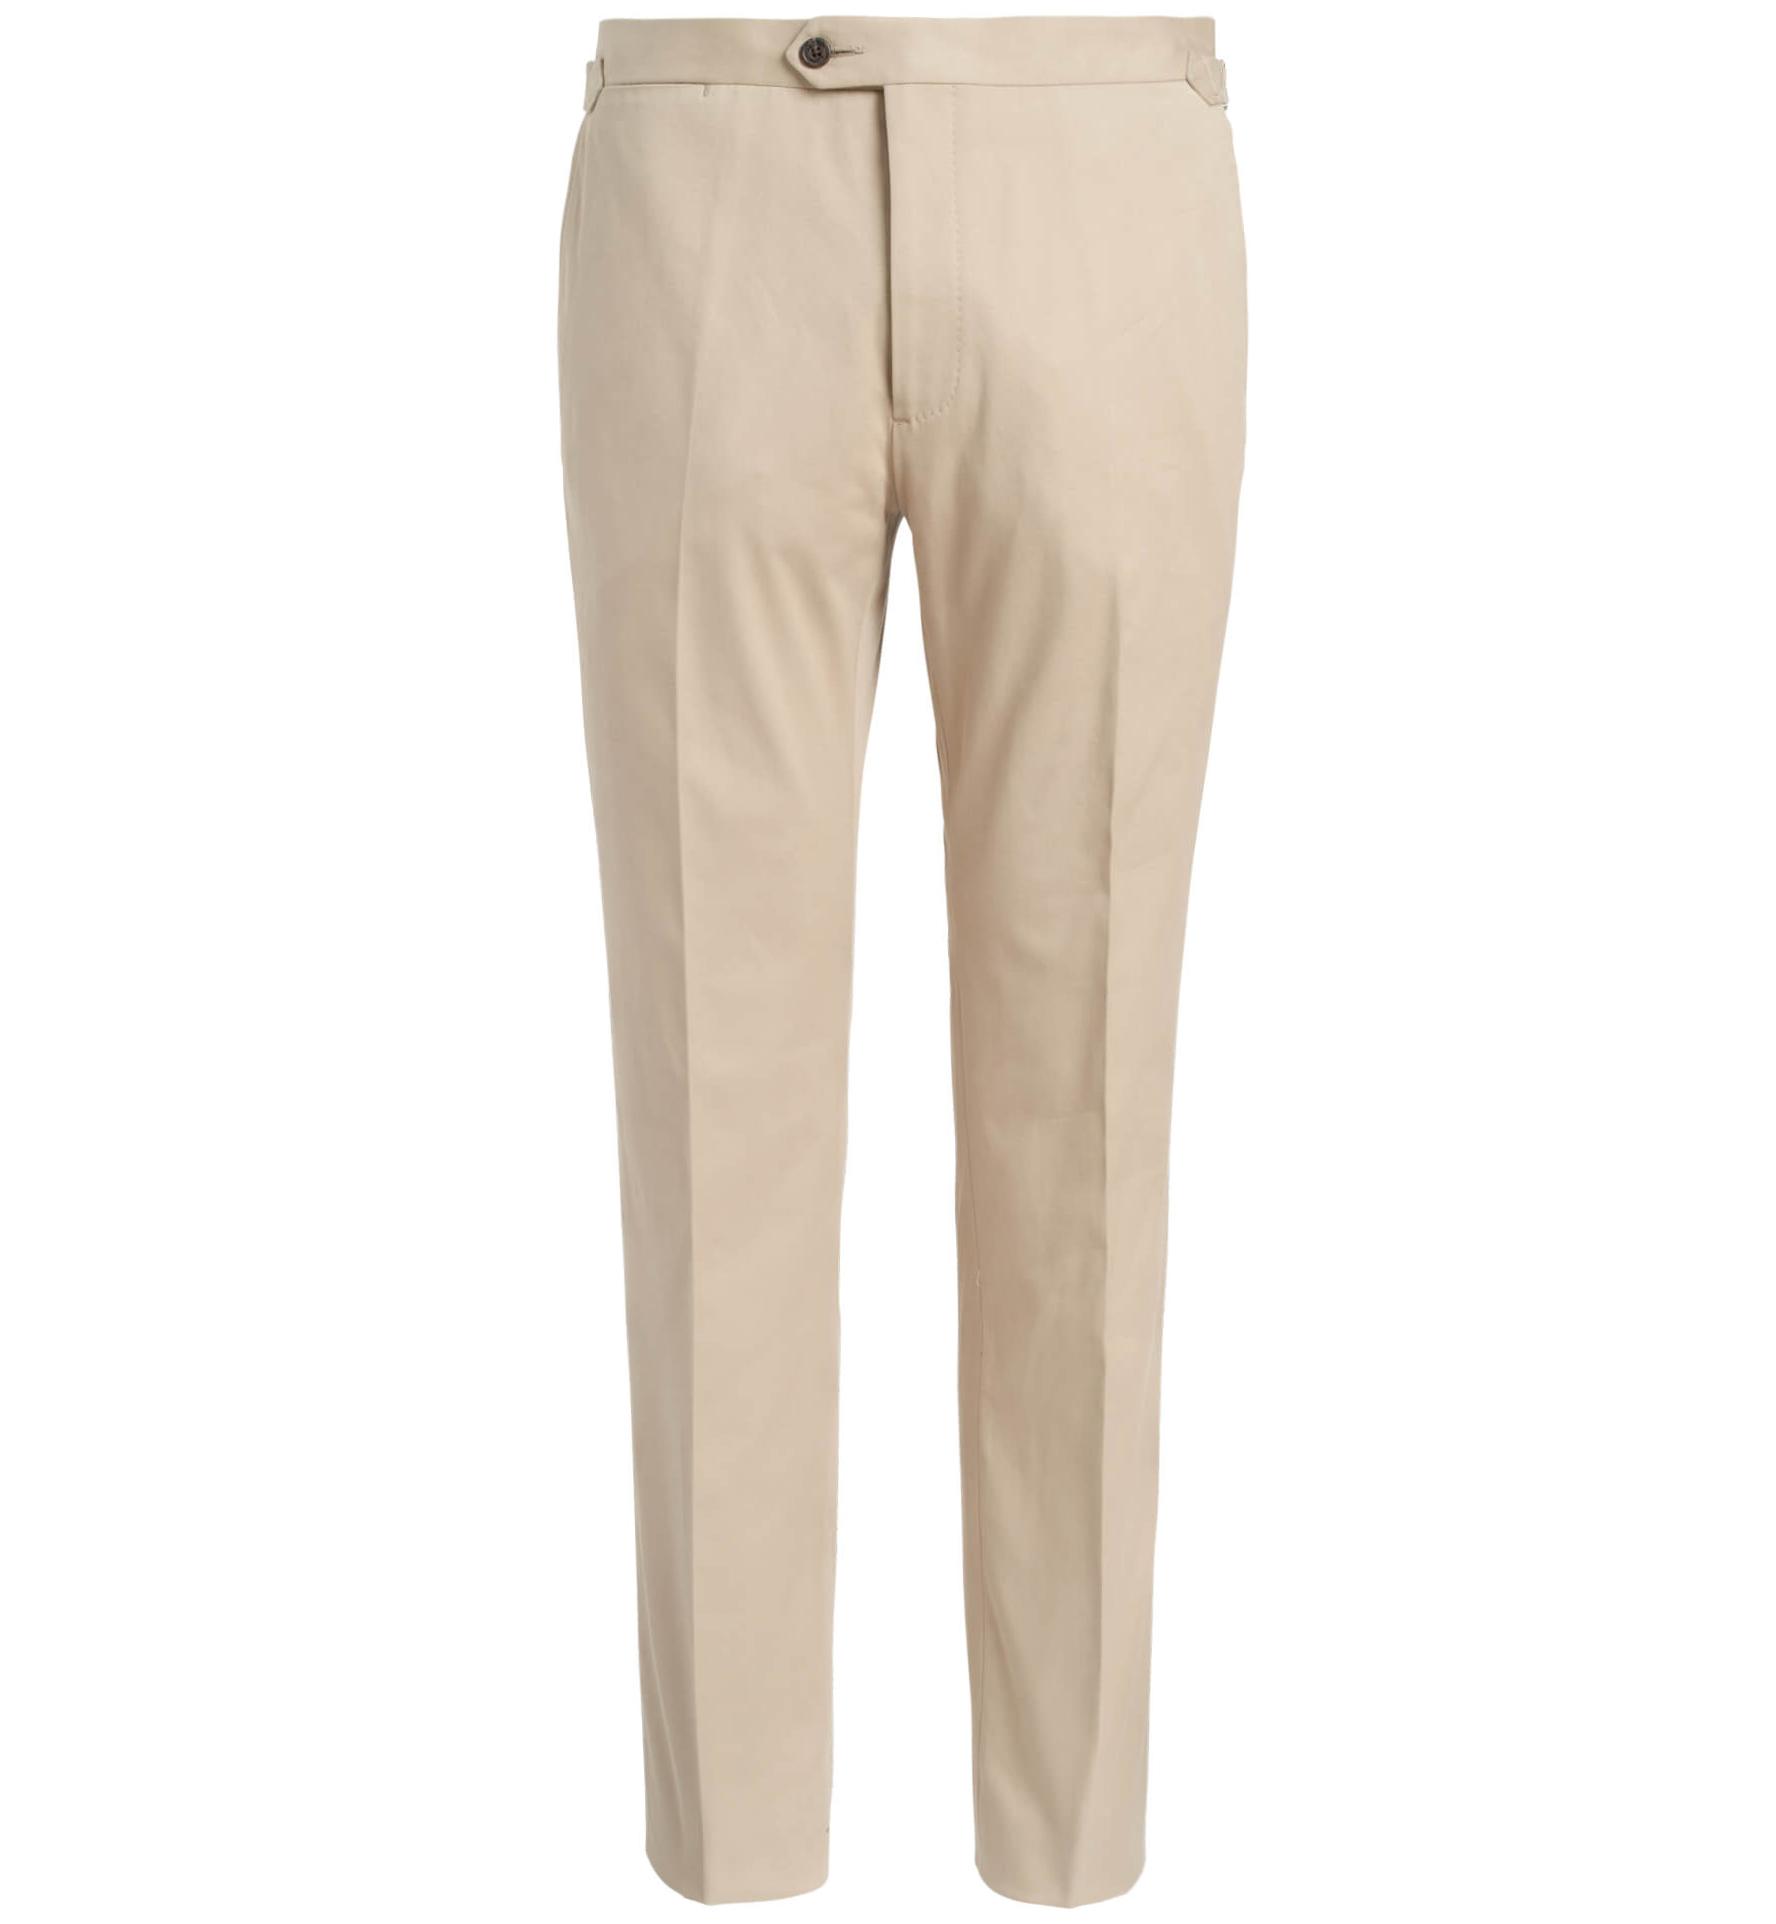 Zoom Image of Allen Beige Stretch Cotton Trouser